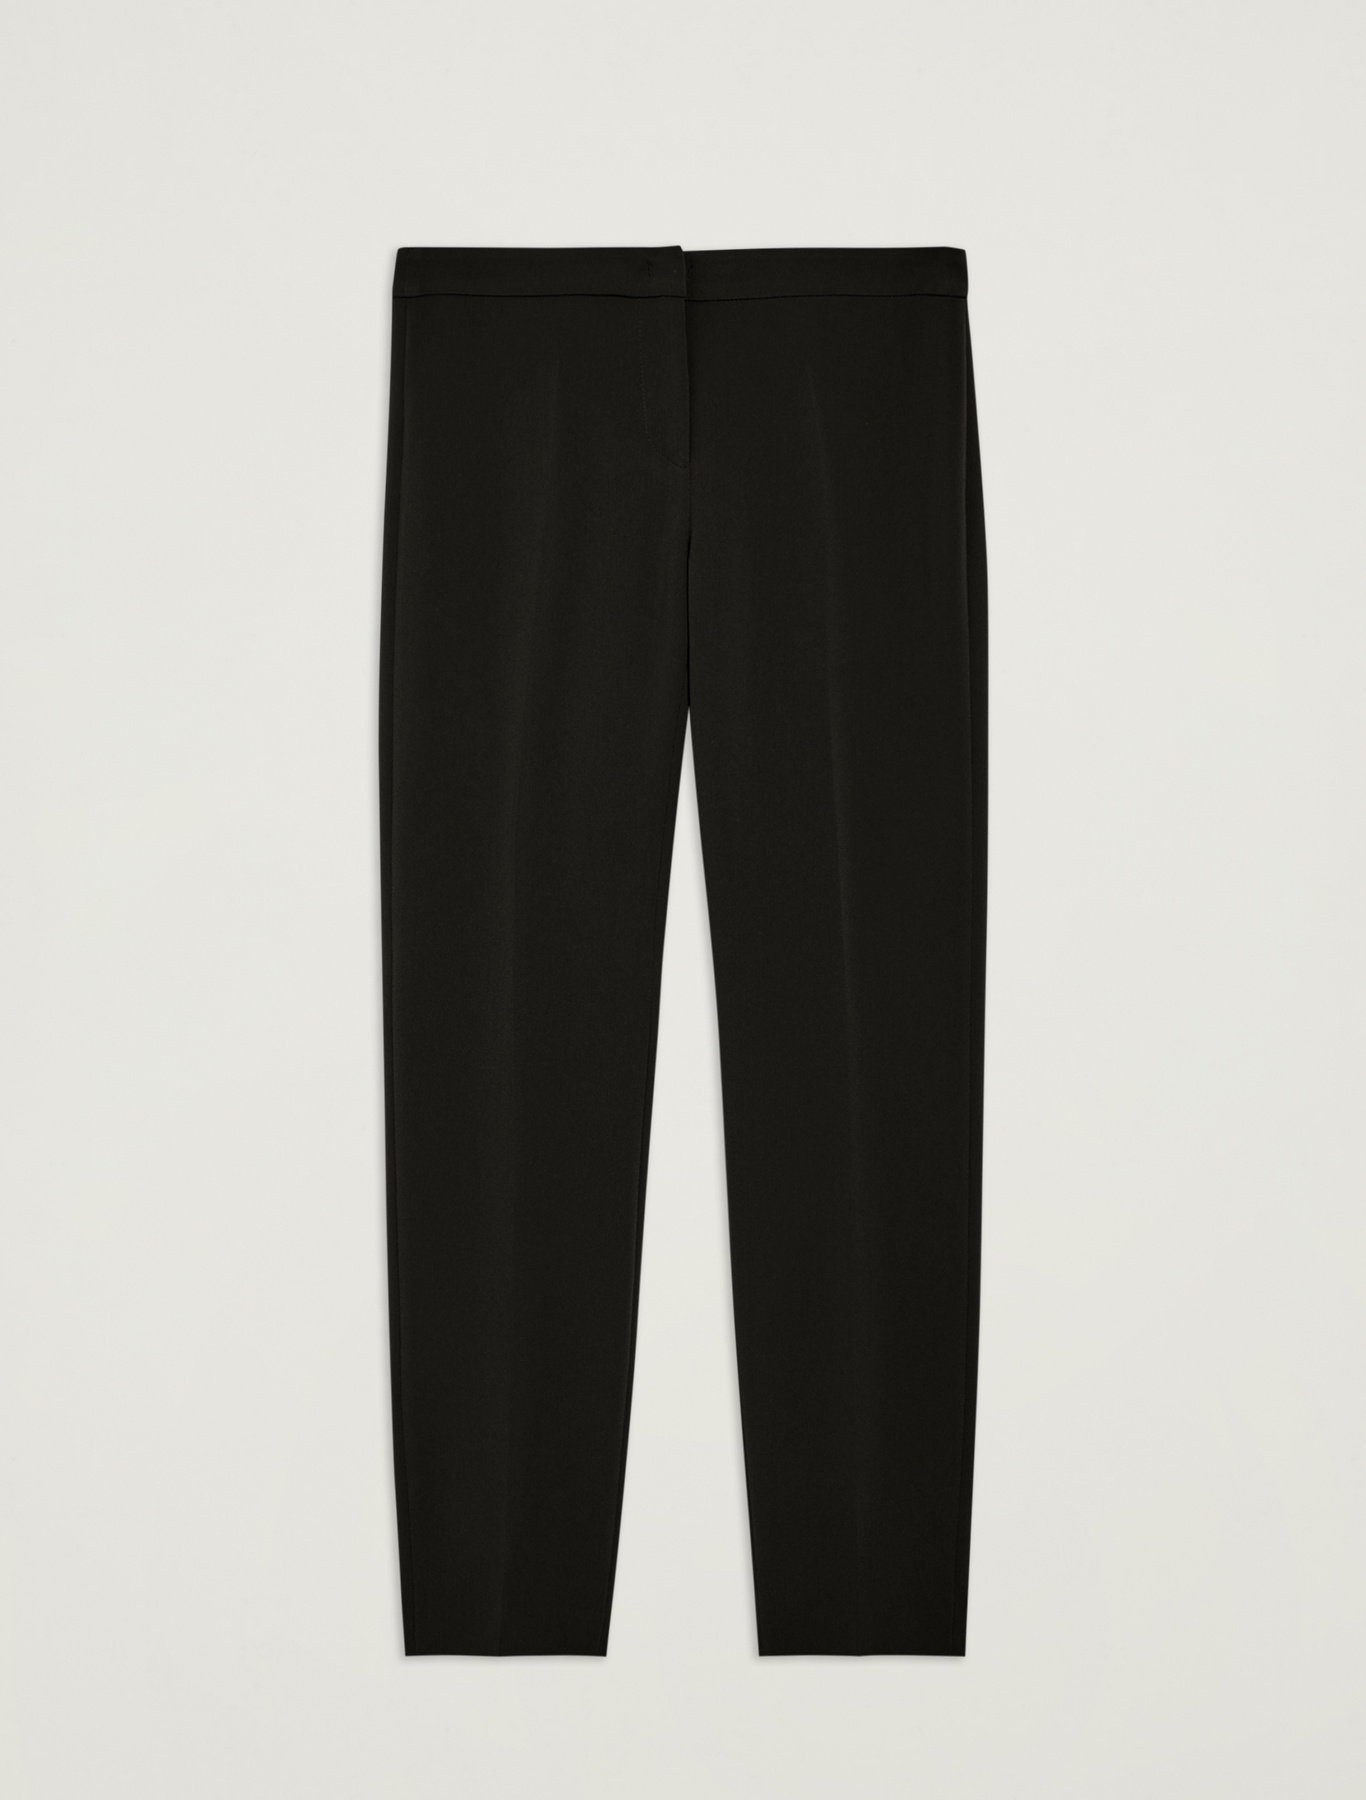 Pantaloni slim fit fluidi - nero - pennyblack